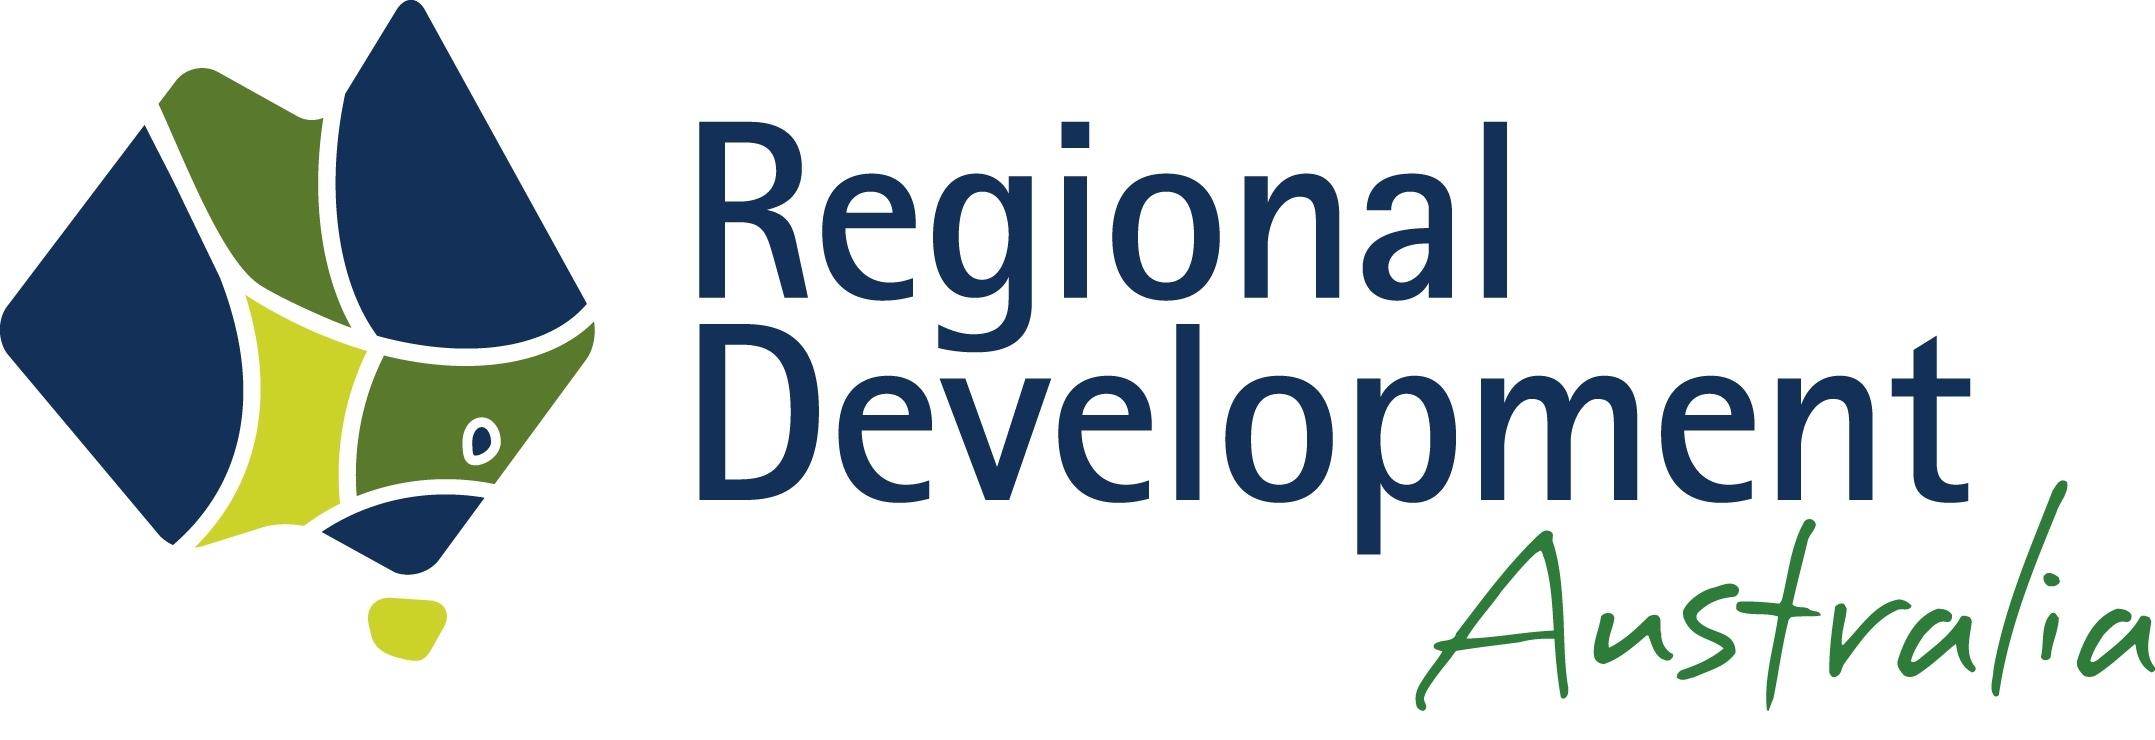 Regional Development Australia Logo